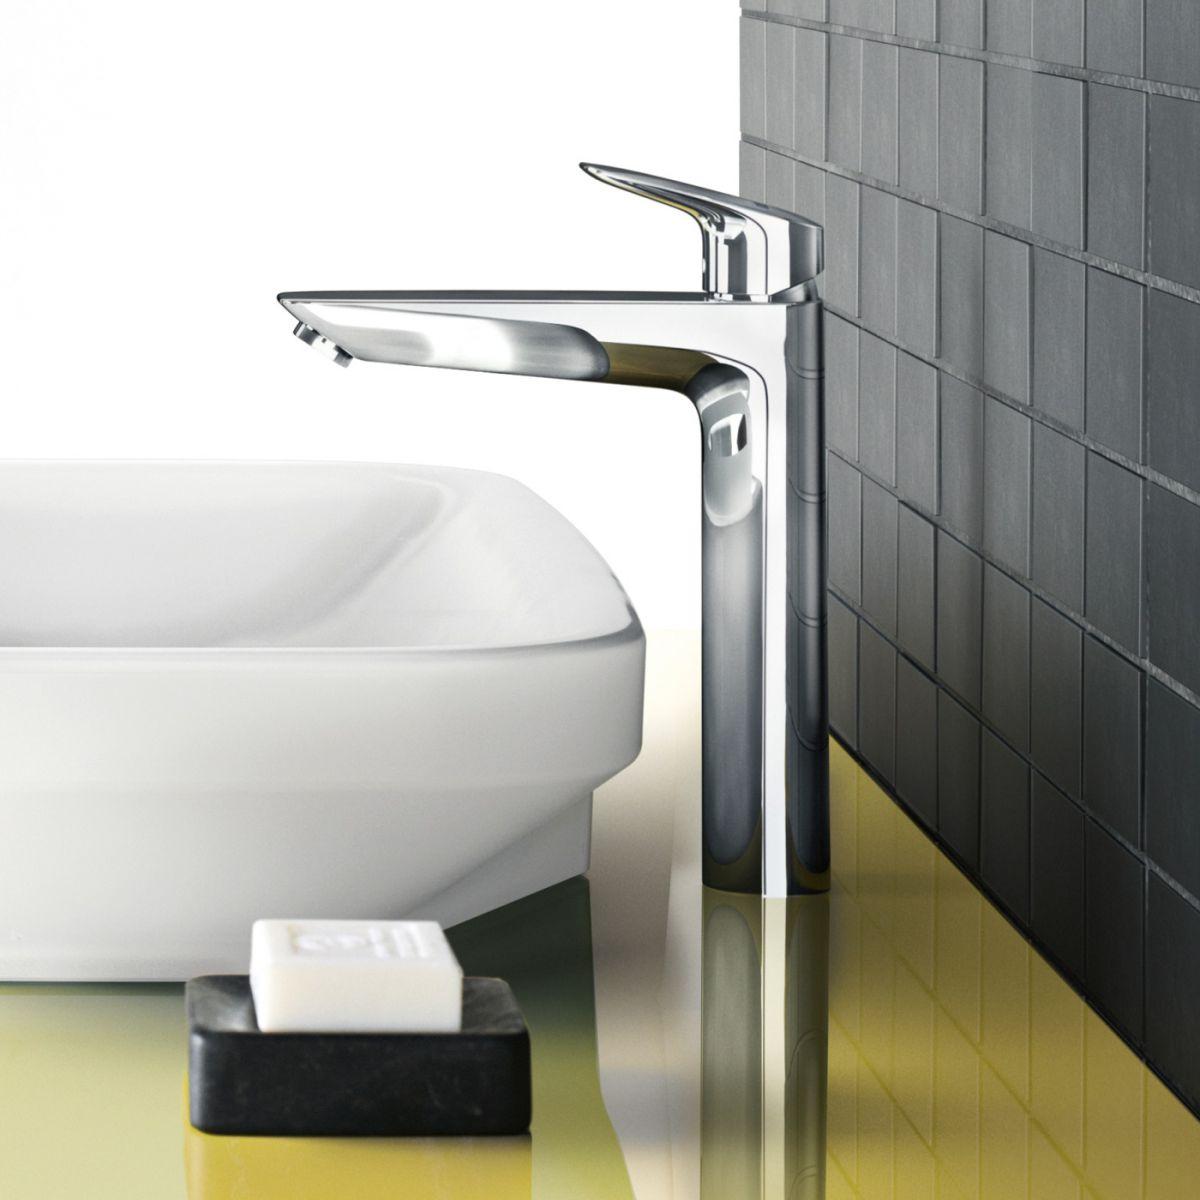 Hansgrohe Logis 190 Tall Basin Mixer | Bathrooms Direct Yorkshire